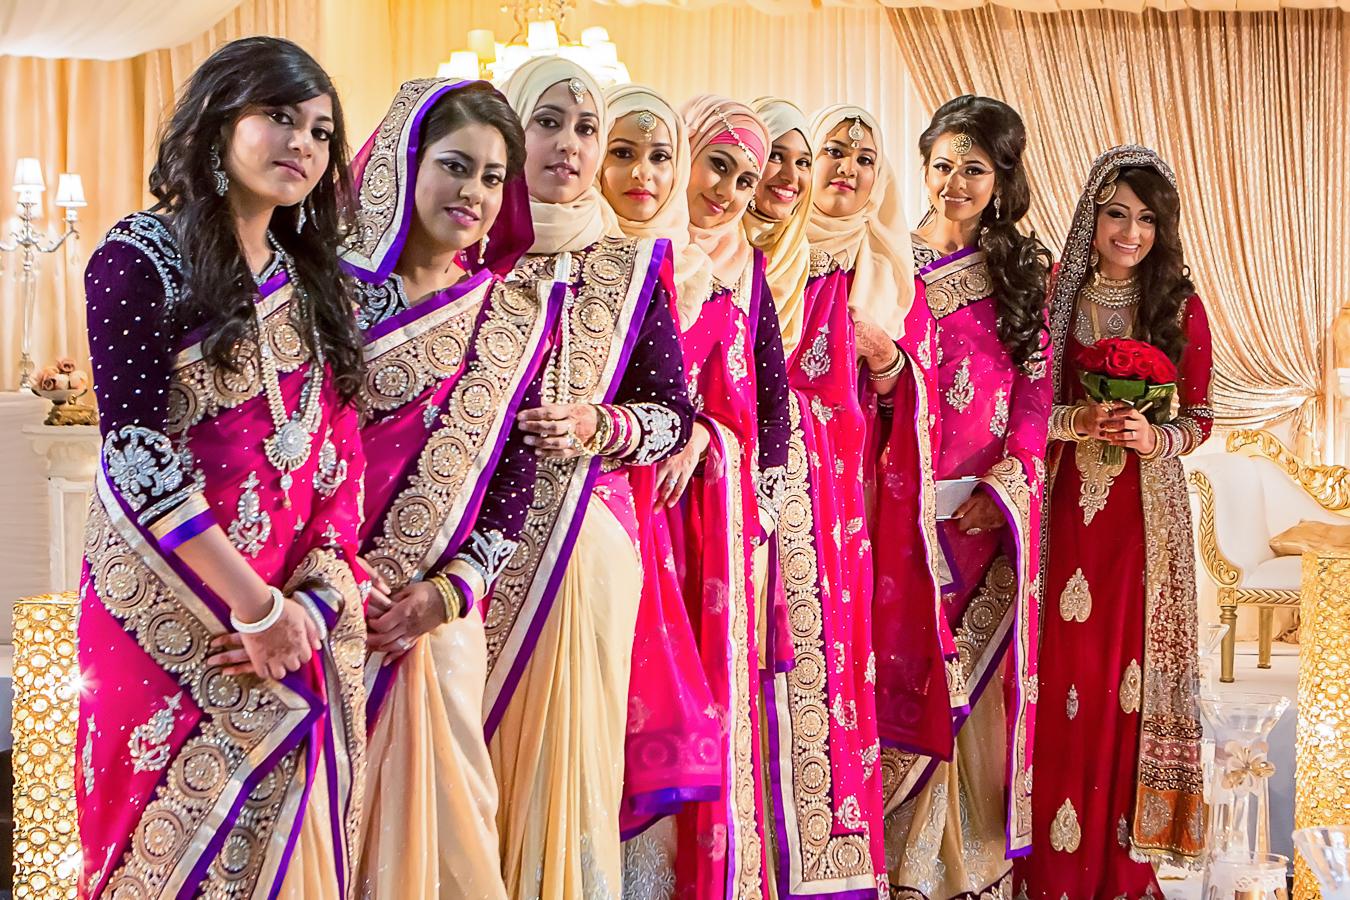 Nasir and Minara wedding at The Sheridan suite Macnchester Didsbury Opu Sultan Photography Manchester and Edinburgh Asian Muslim Hindu Sikh-49.jpg